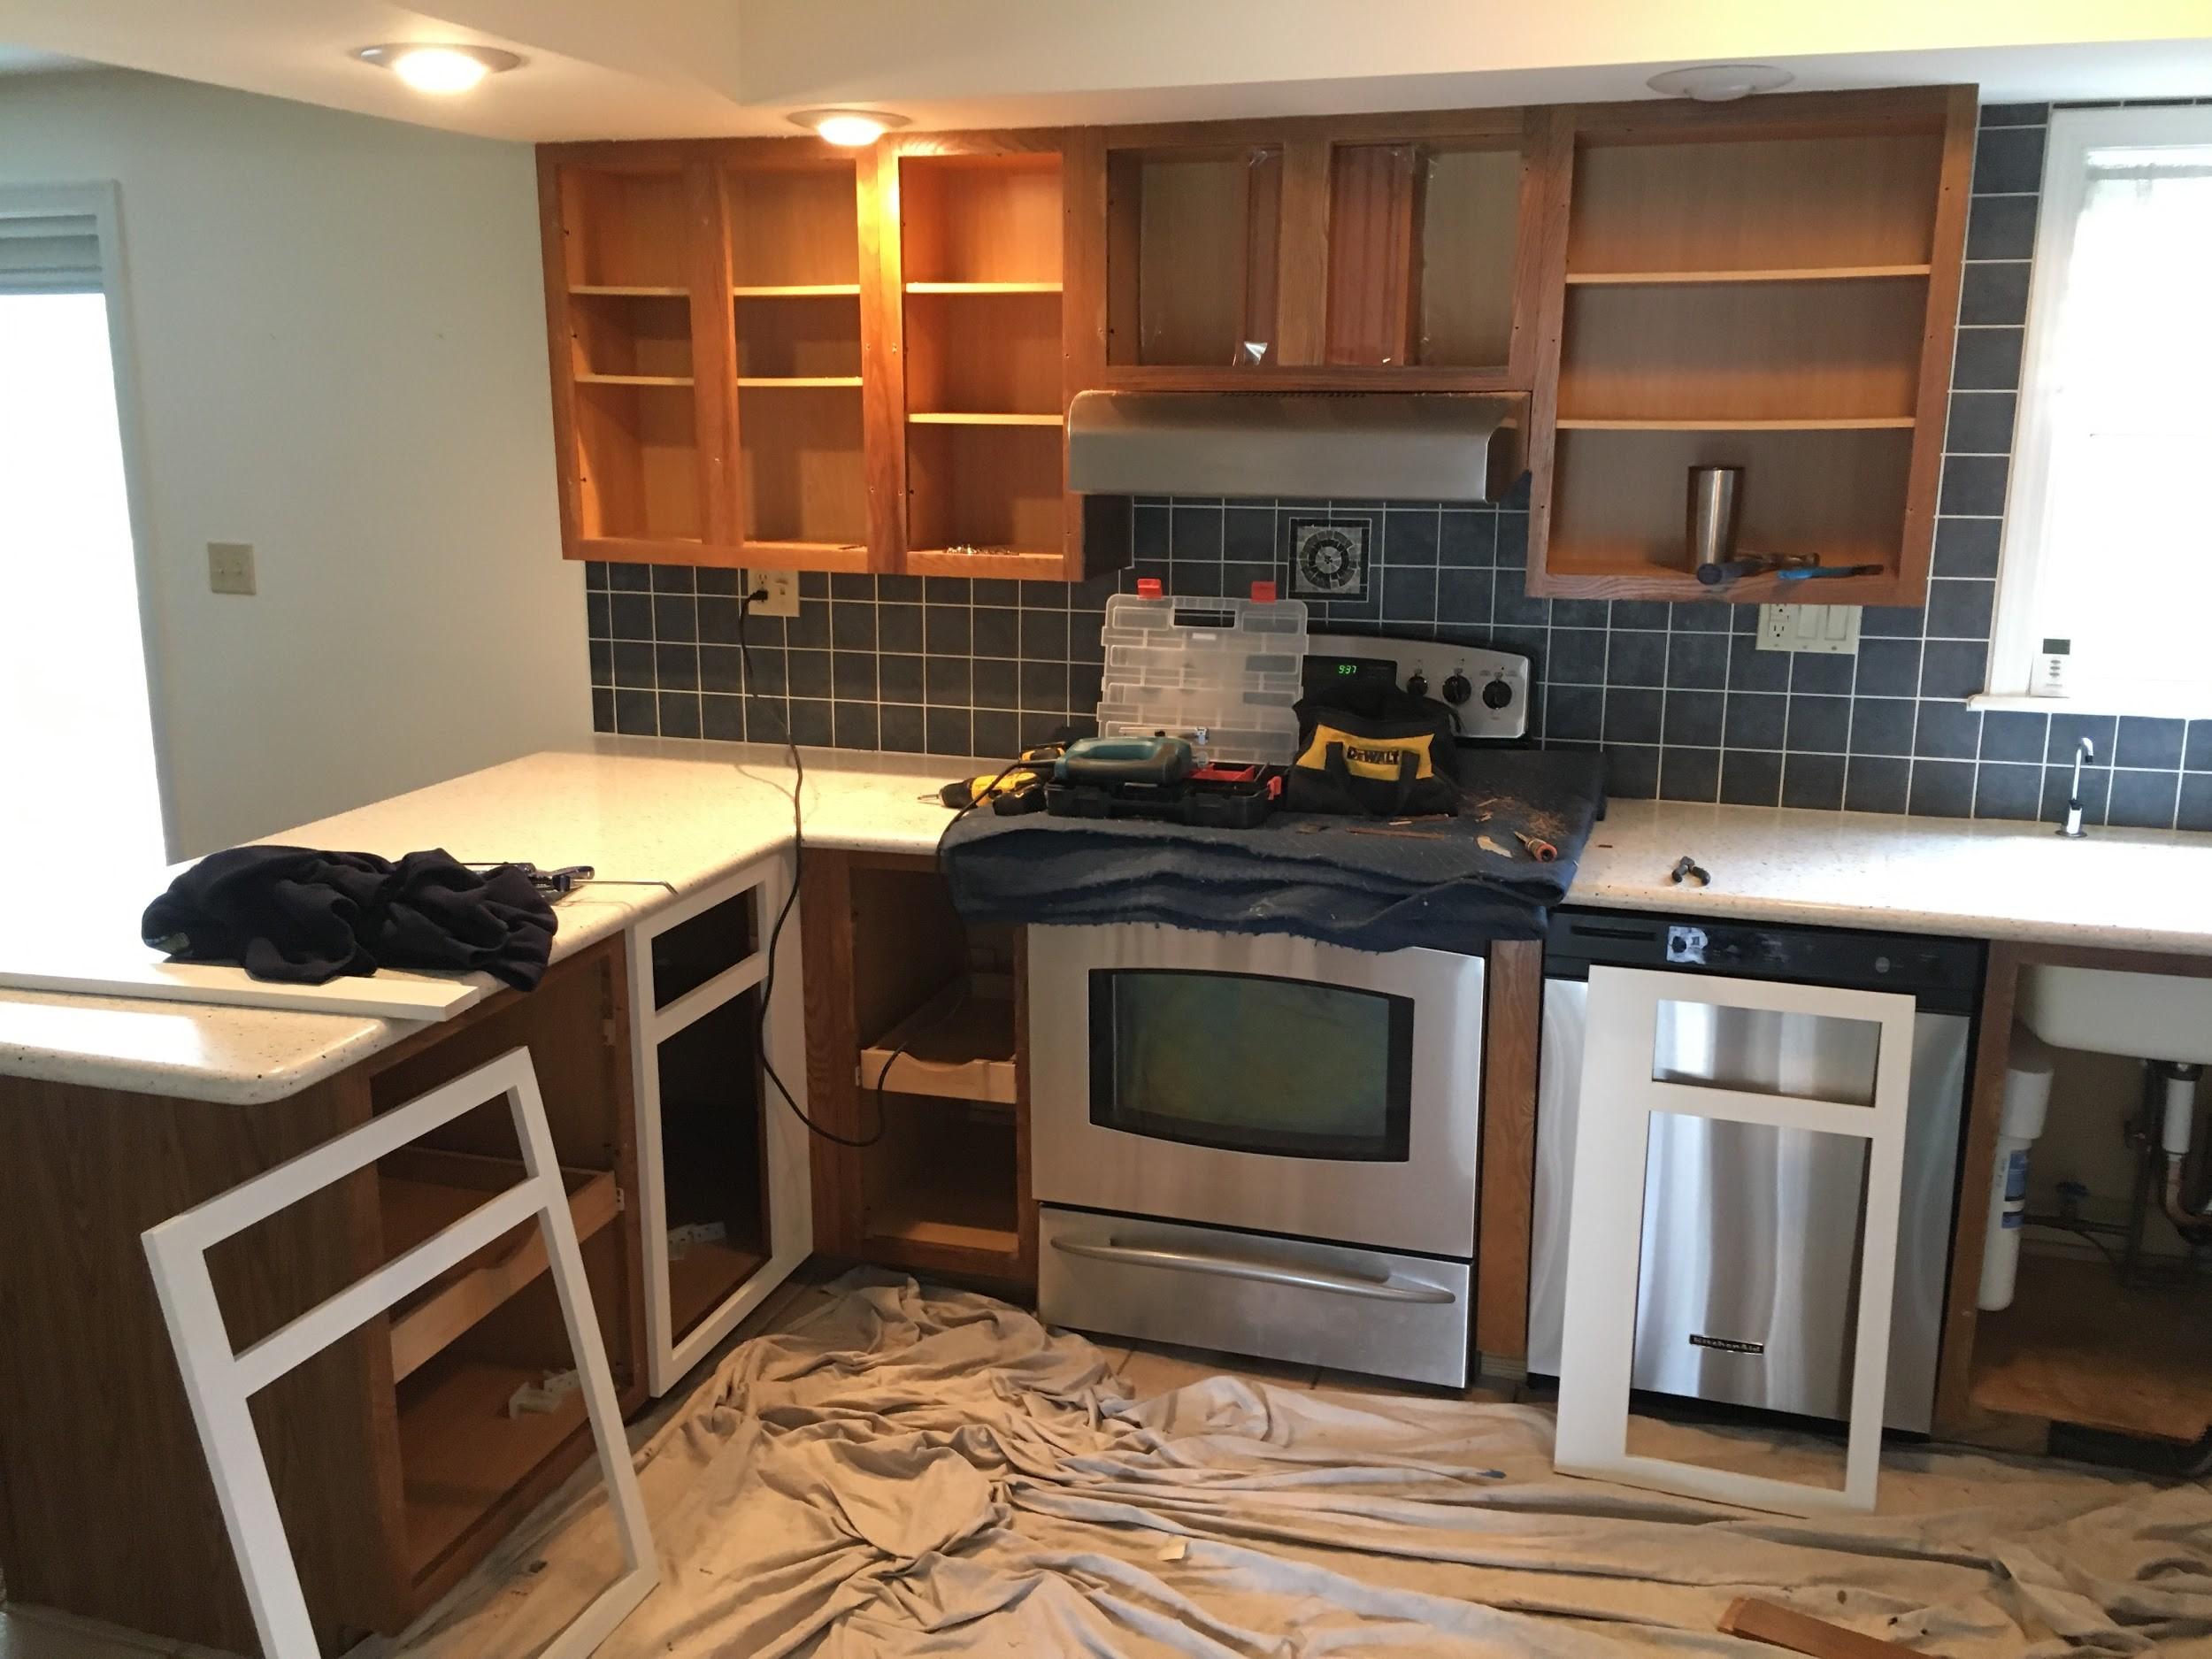 Kitchen Refacing Services In Bucks County Pa Burlington